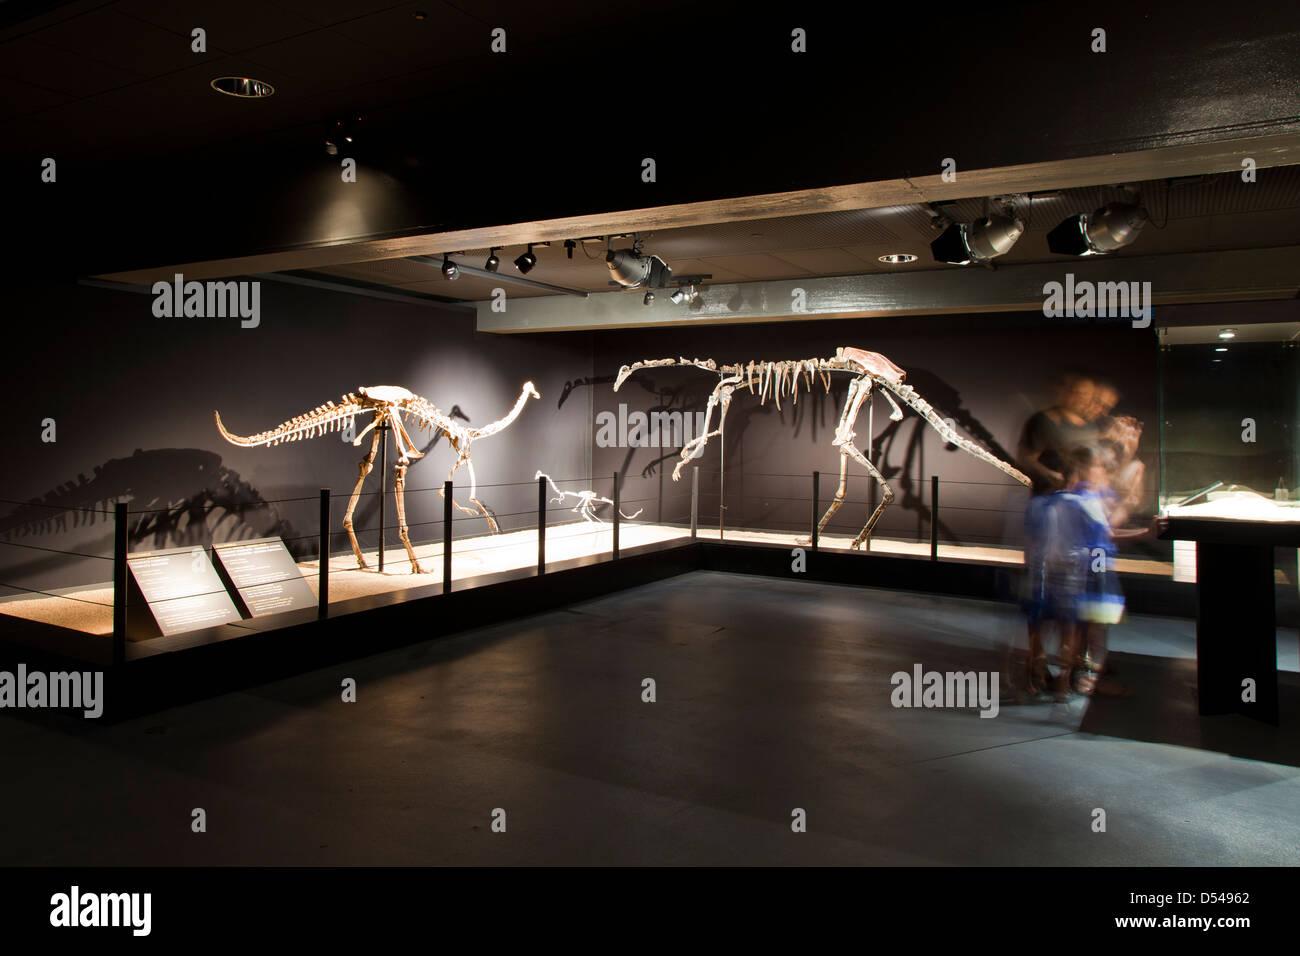 Exposition of Dinosaurs from Gobi desert in Mongolia. Cosmocaixa museum, Barcelona, Spain - Stock Image